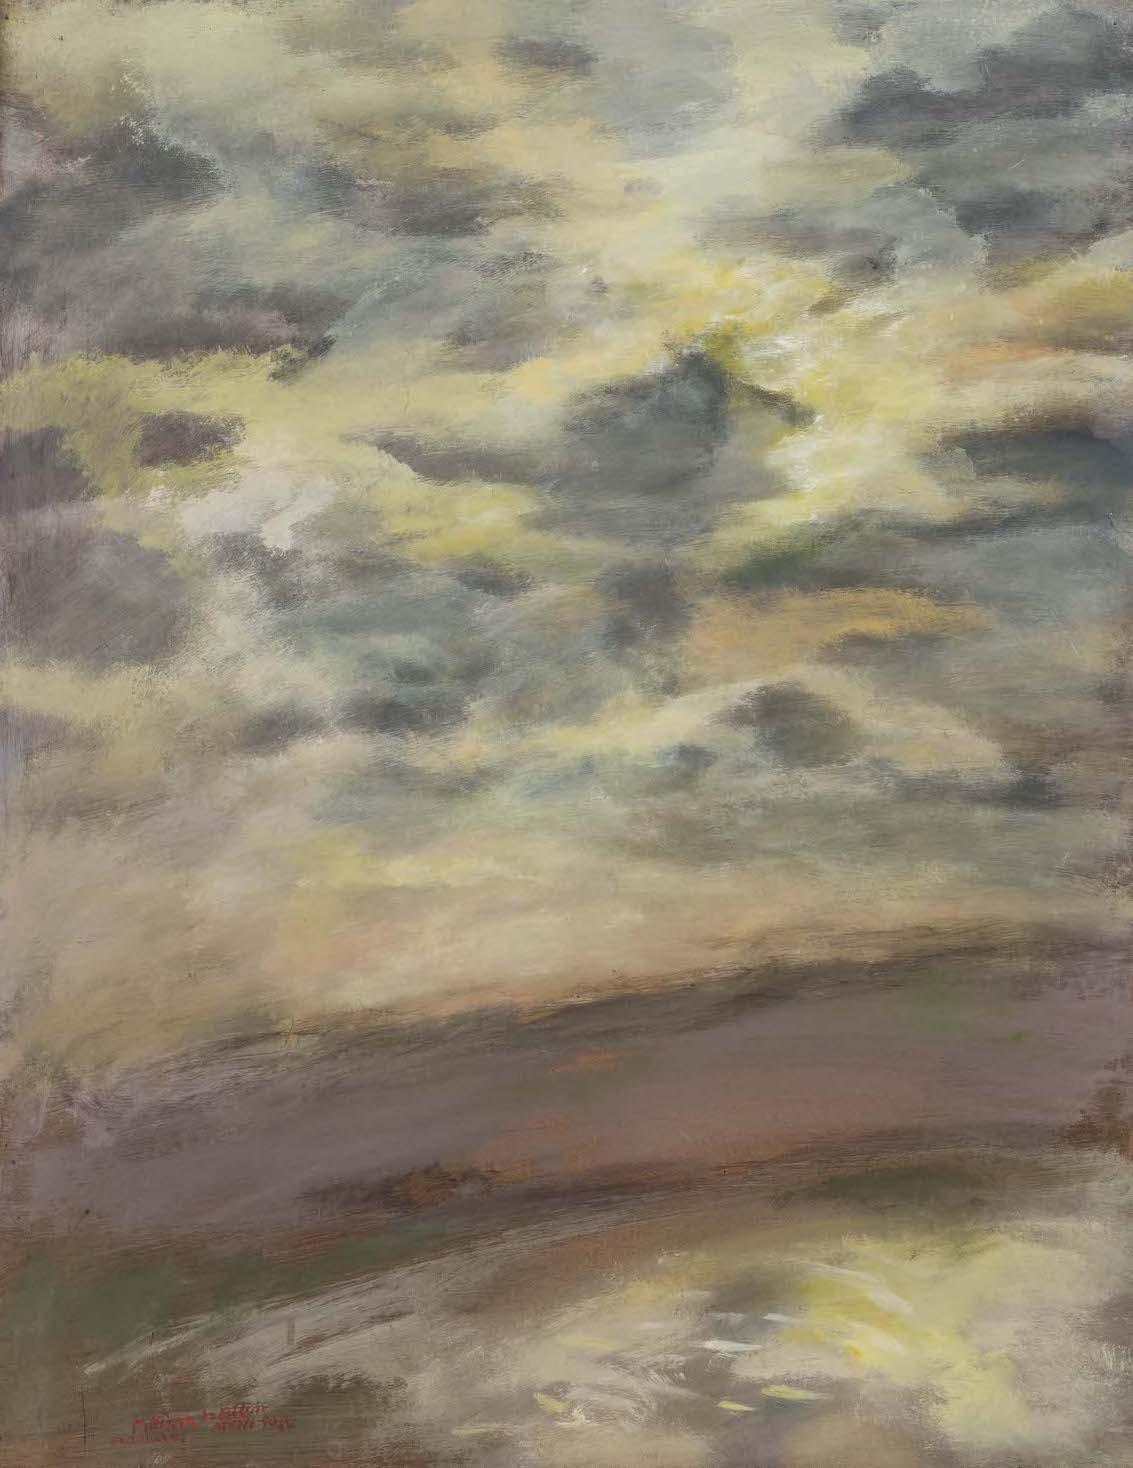 Wolkenbild Haindling, 1984